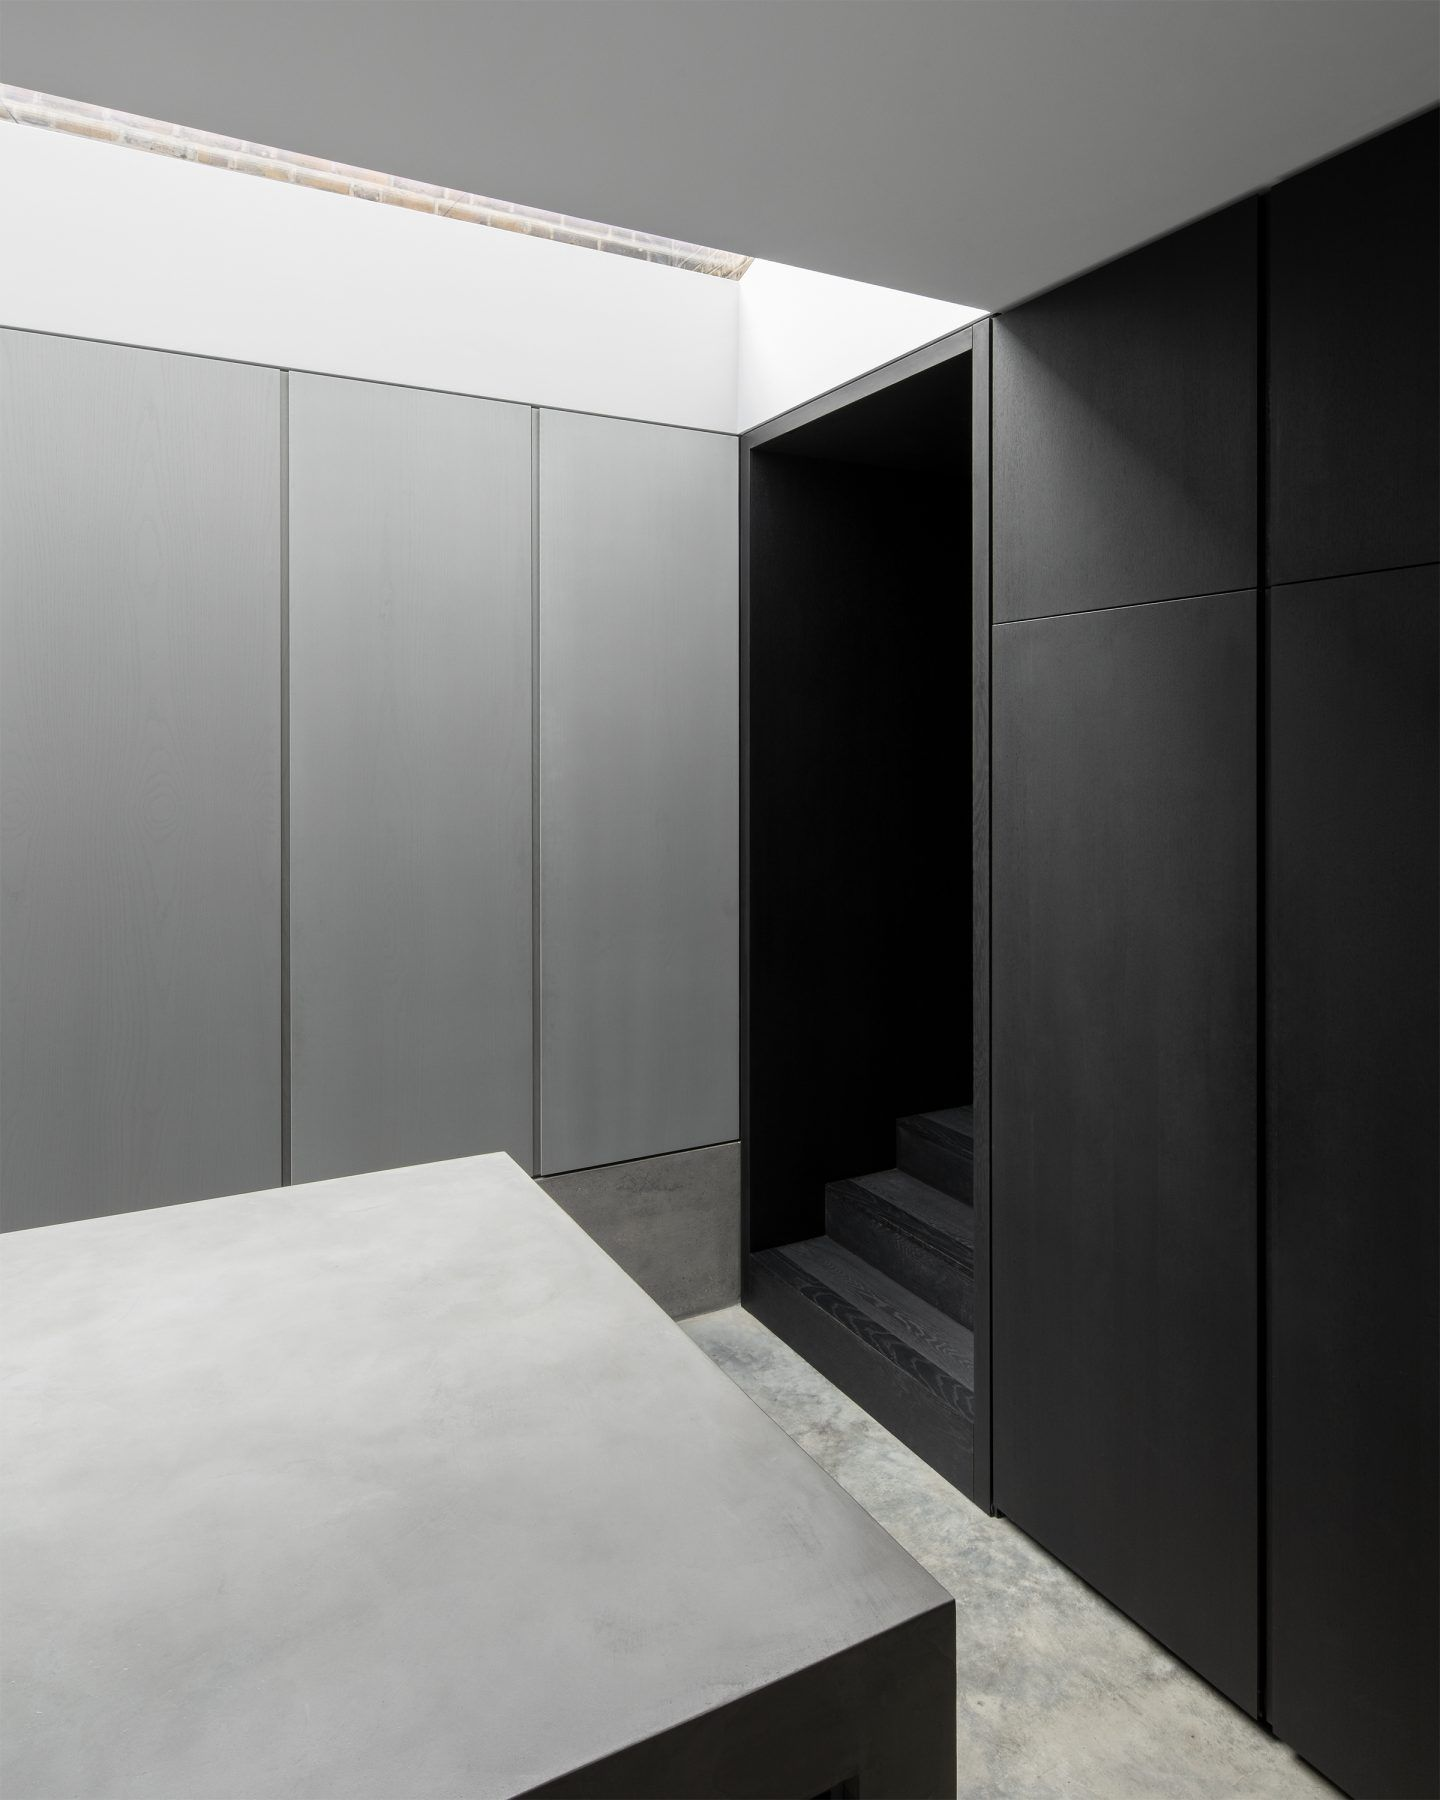 IGNANT-Architecture-Al-Jawad-Pike-Elsley-Road-7